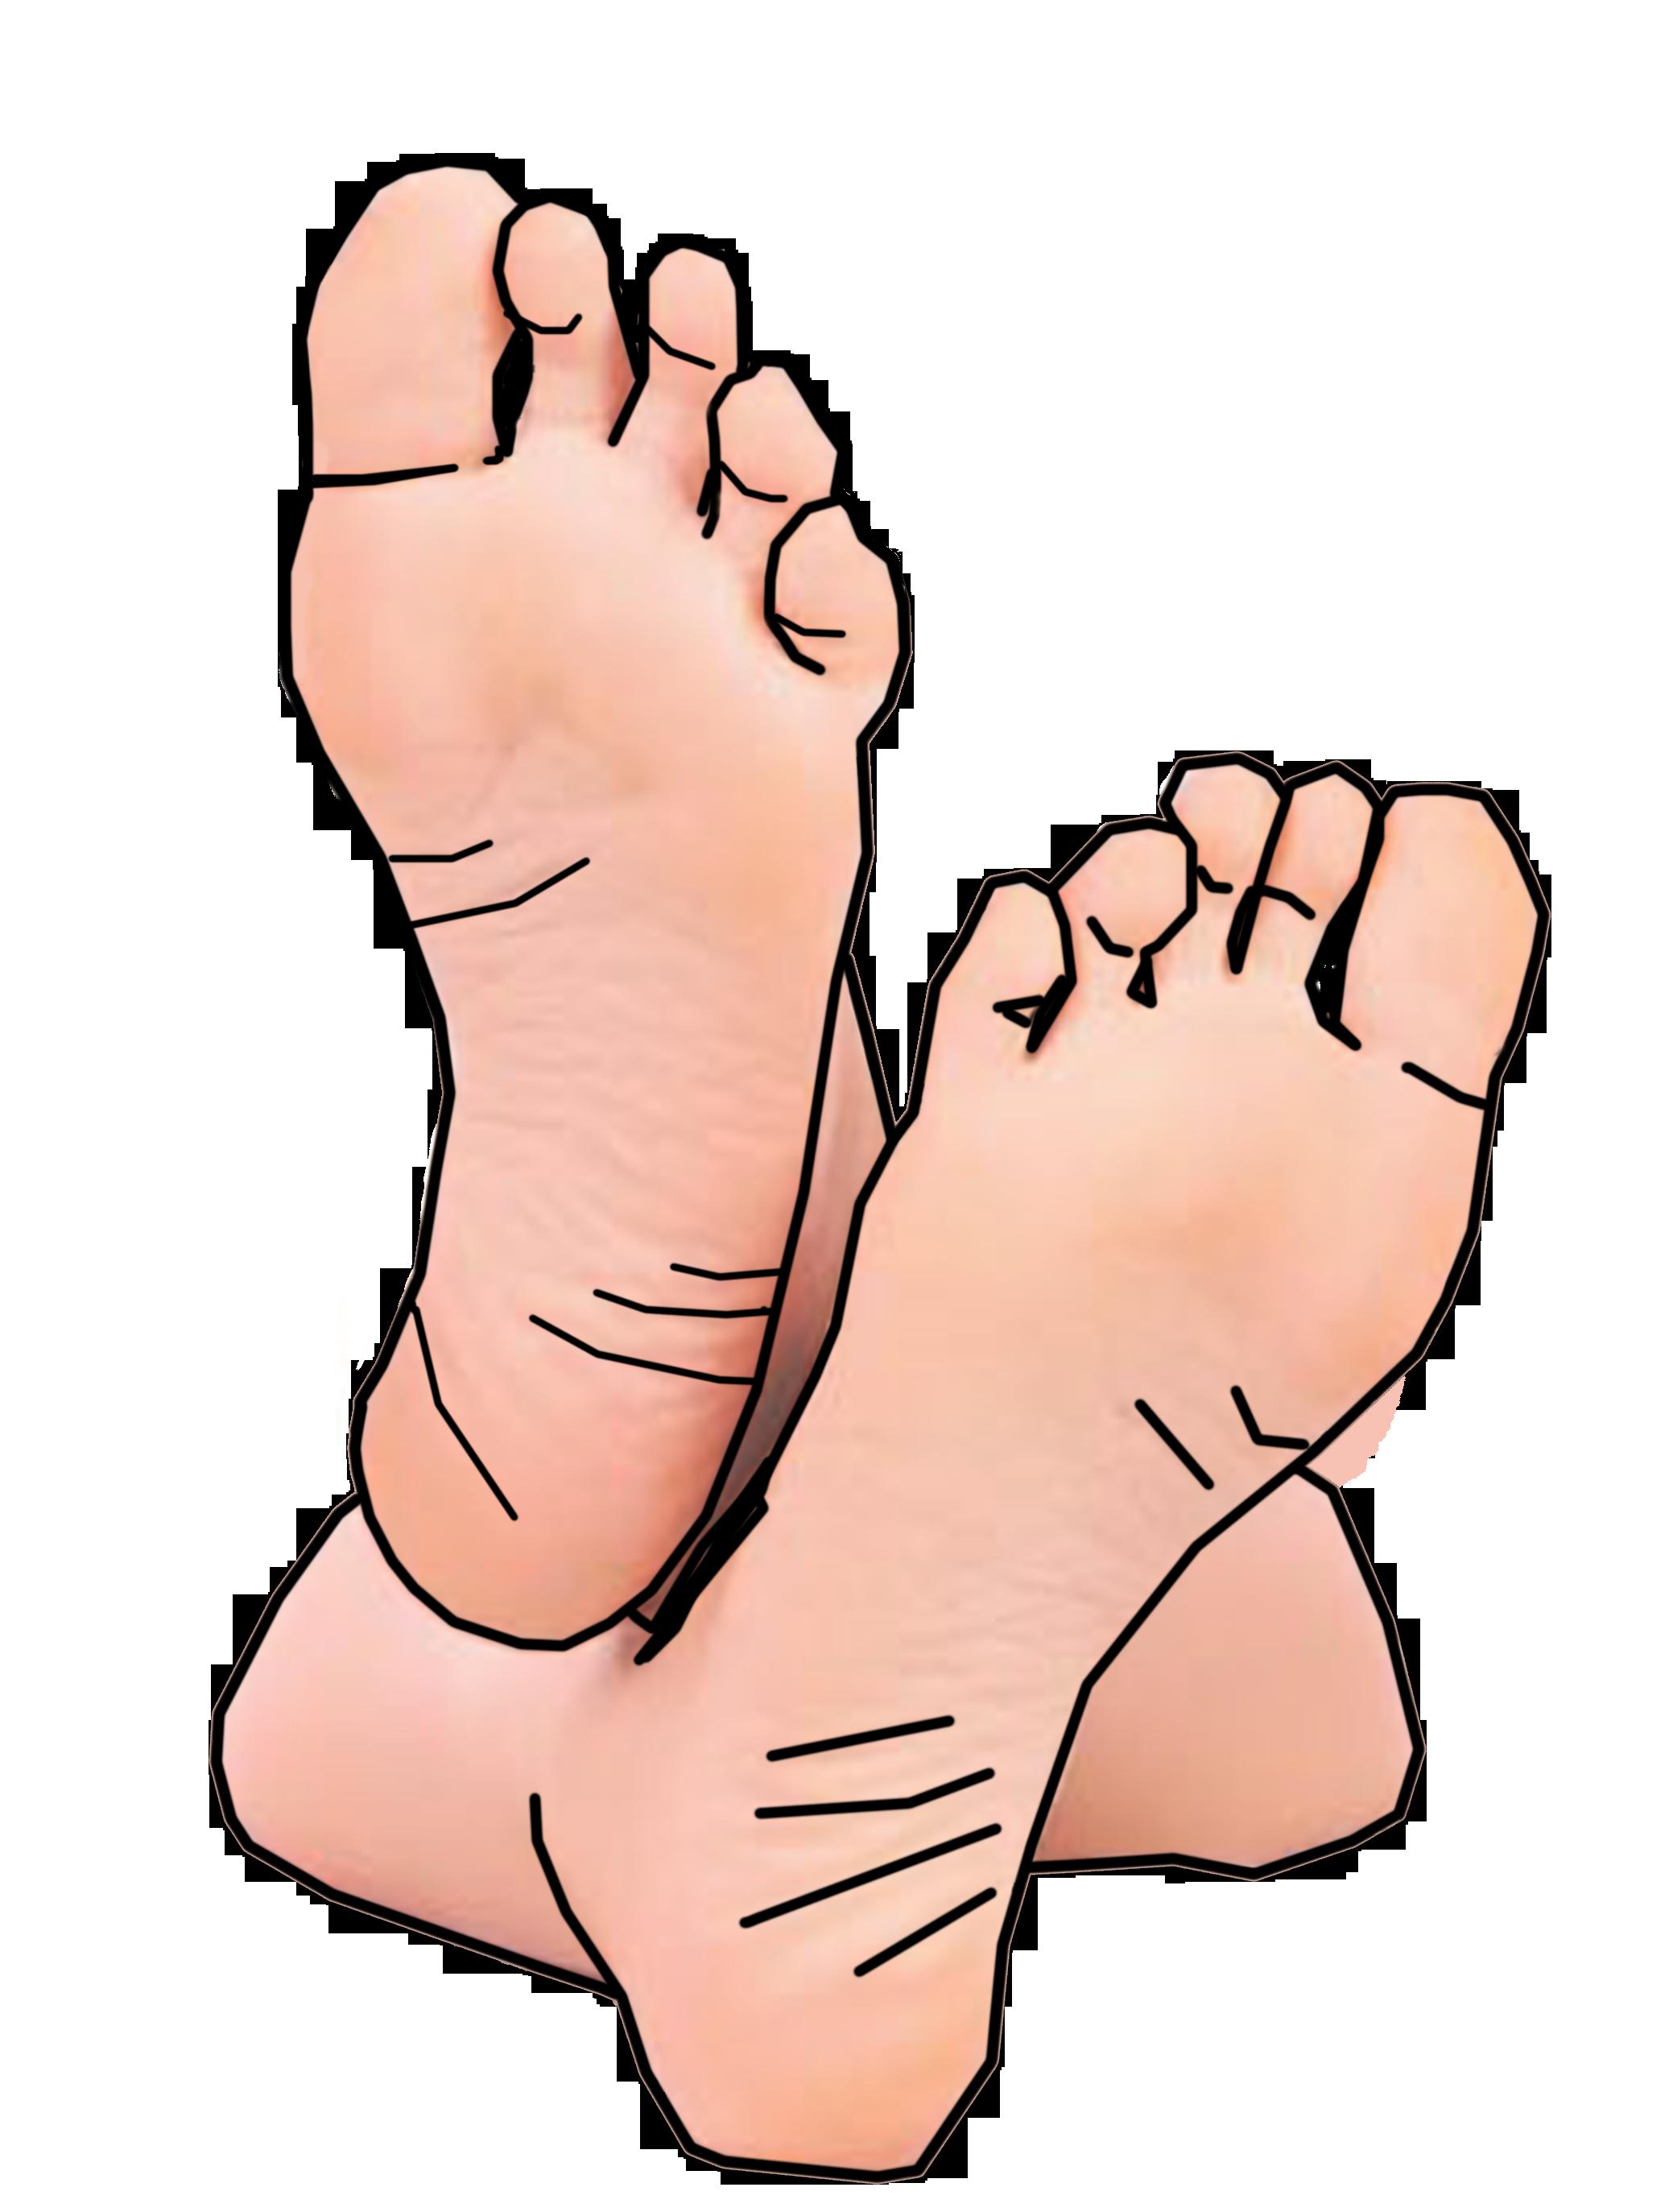 Cartoon Feet Clip Art Toes free image.